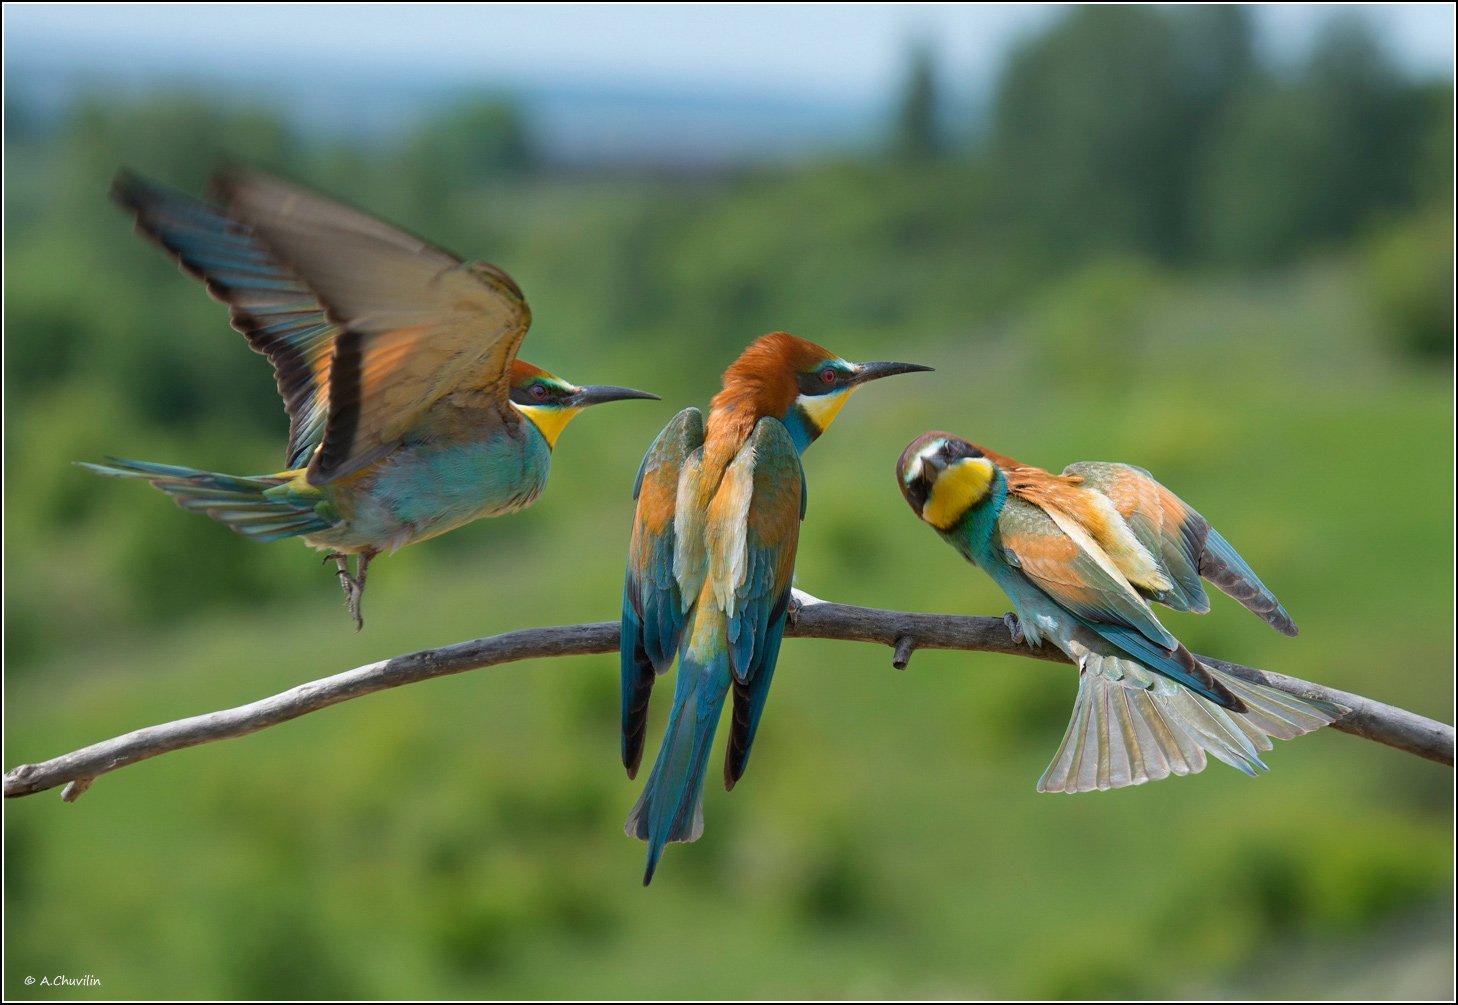 птицы,щурки,три,грации, Александр Чувилин